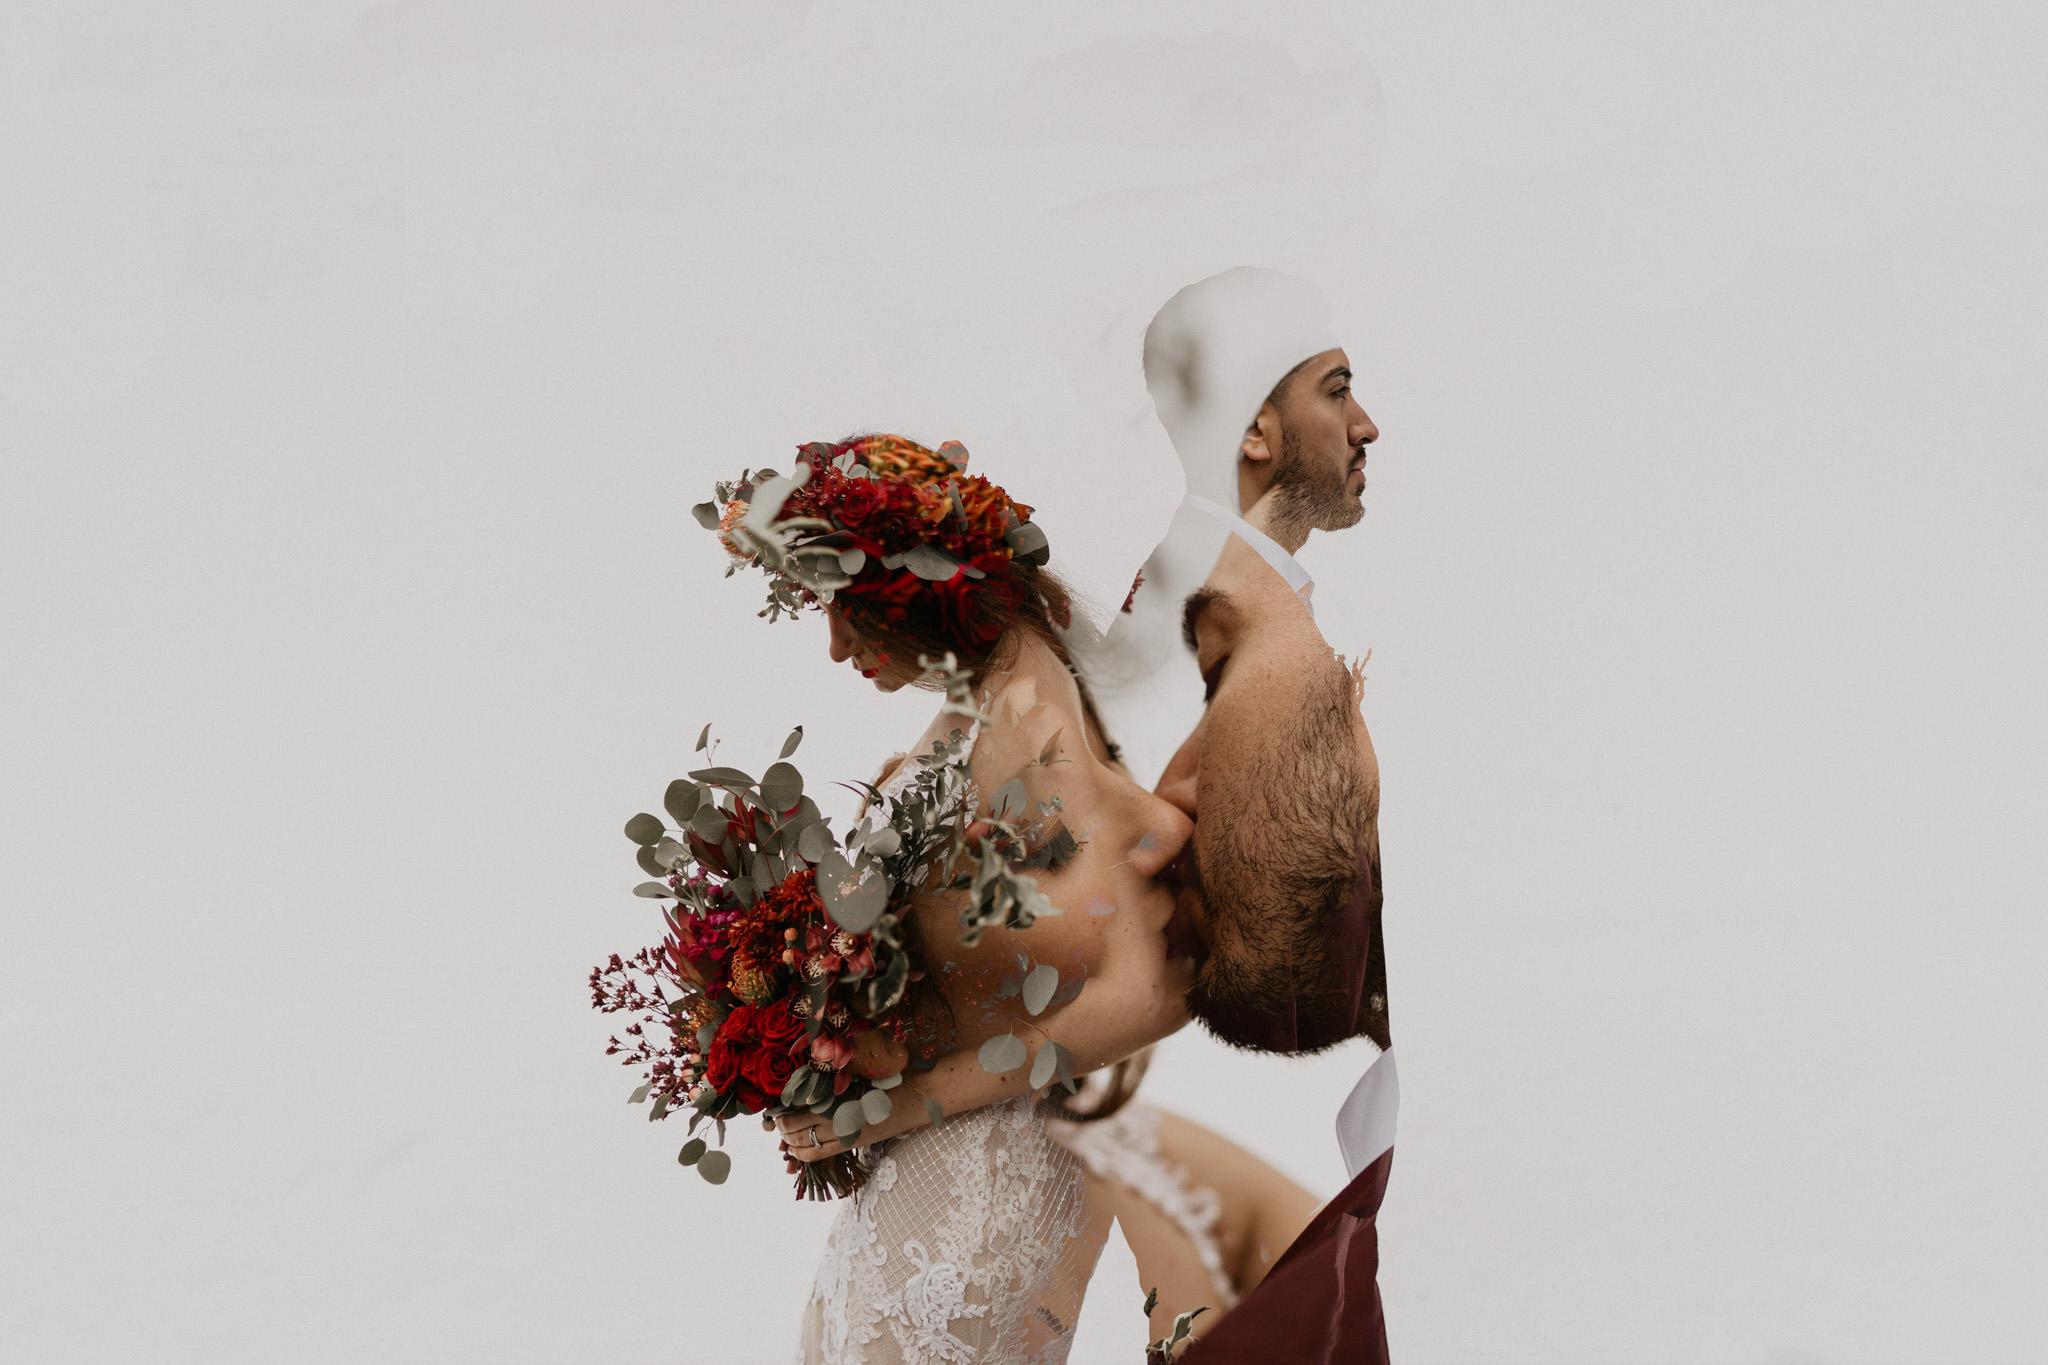 double-exposure-art-intimate-adventure-wedding-mount-rainier.jpg